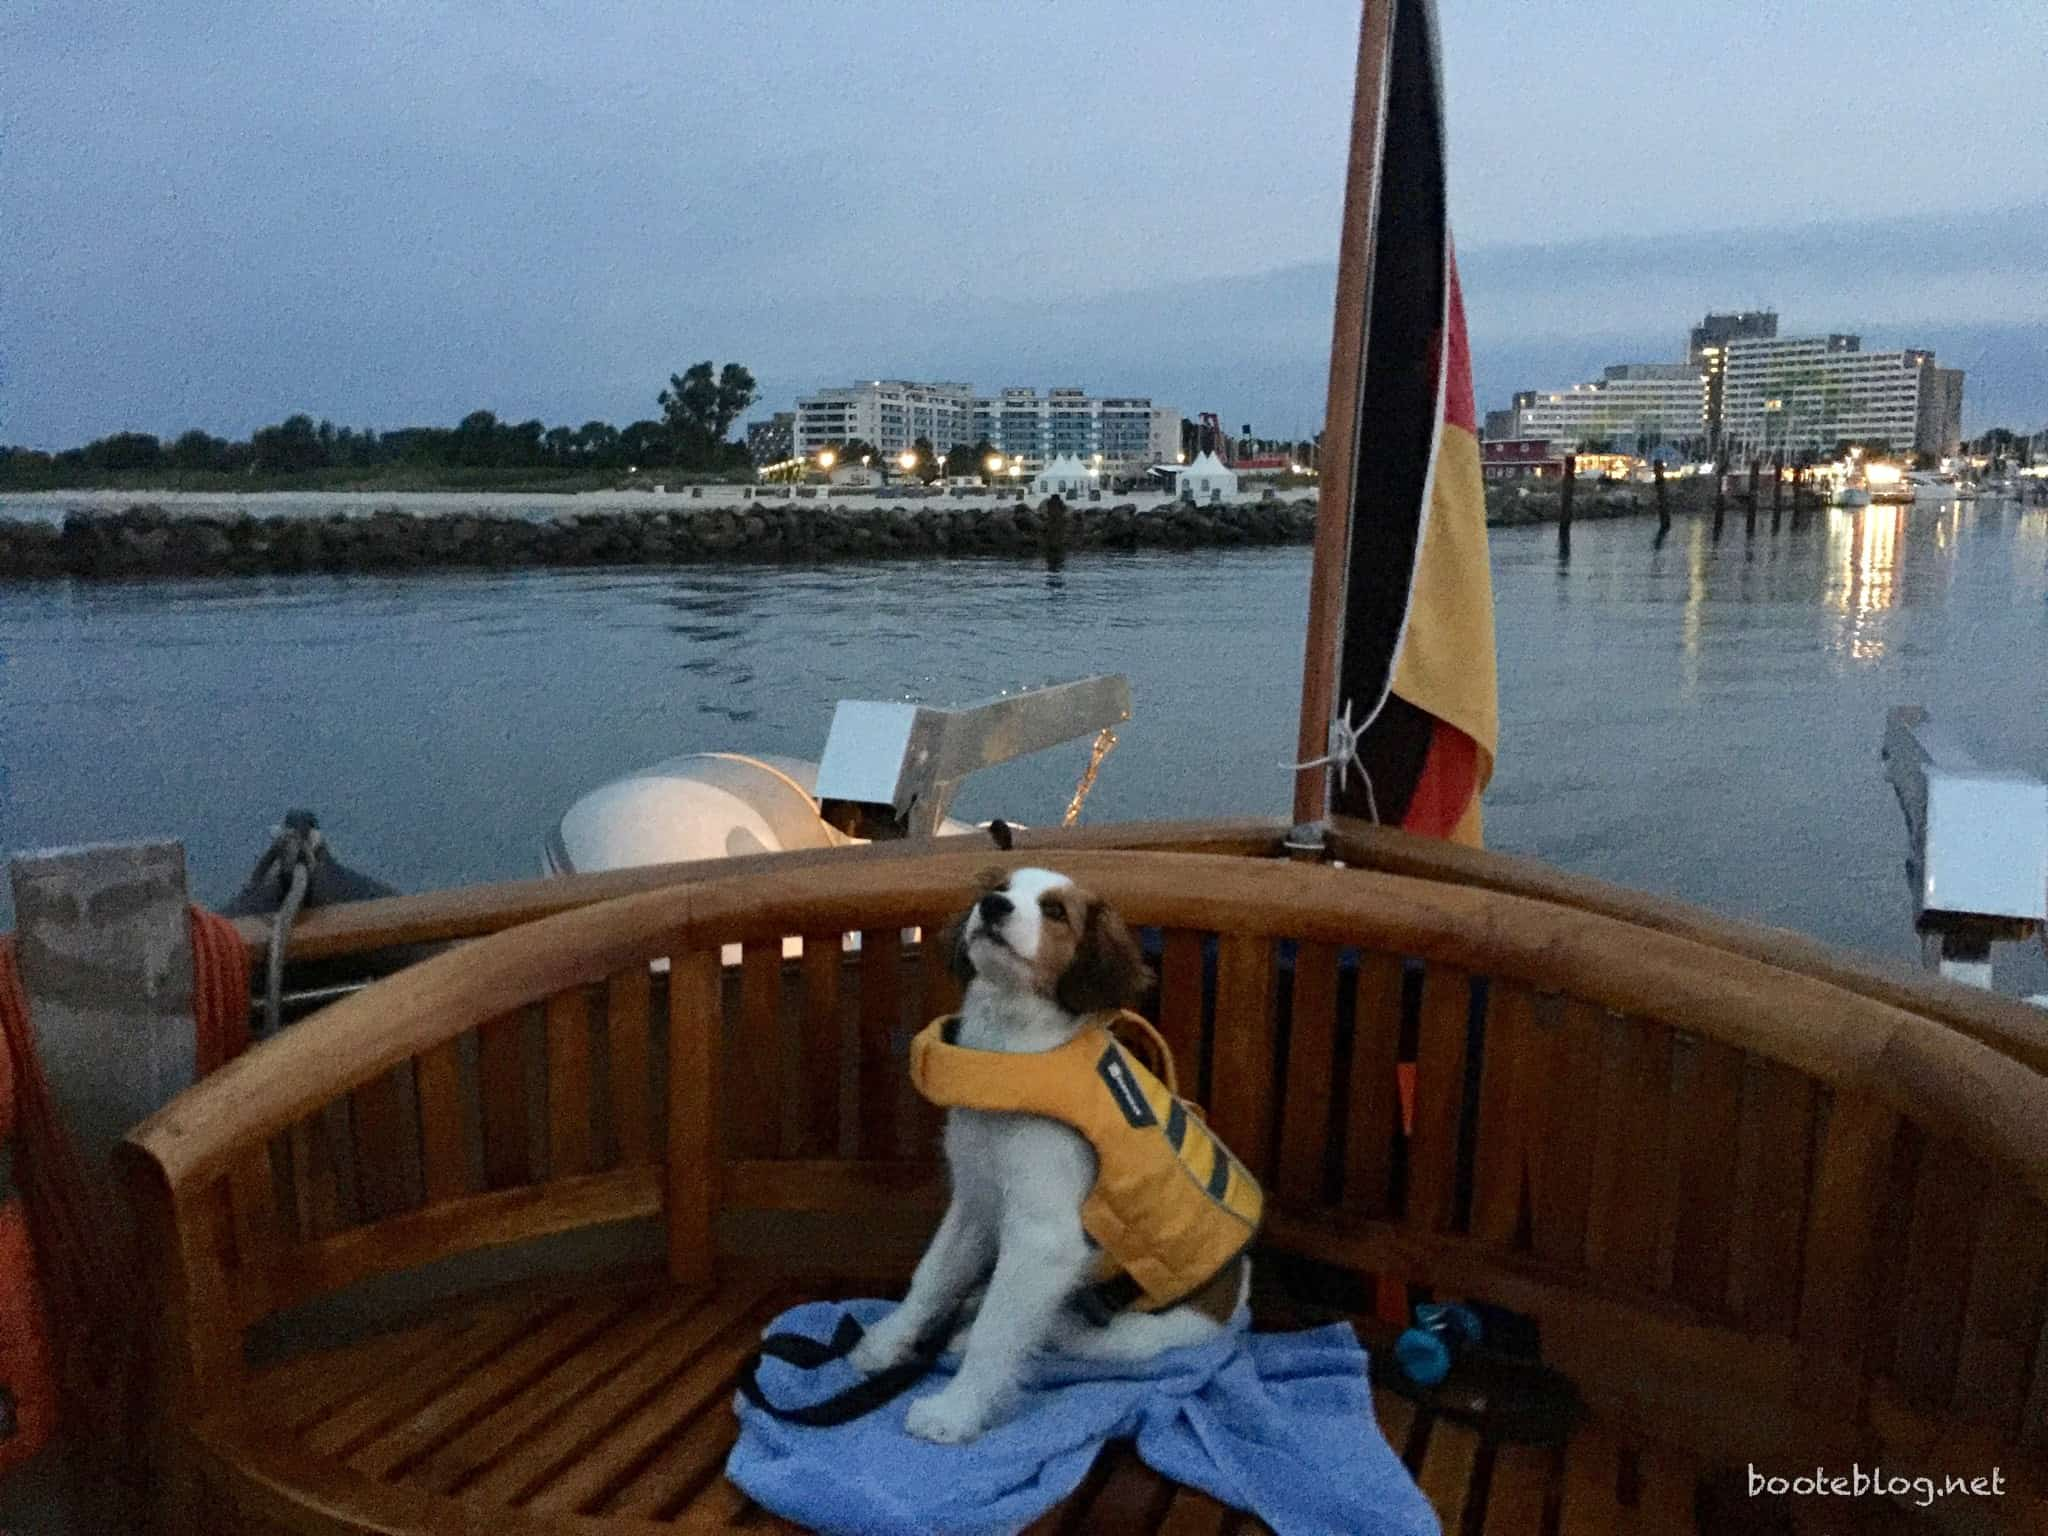 Kooikerhondje Bordhund Ole auf seiner Manöverstation.